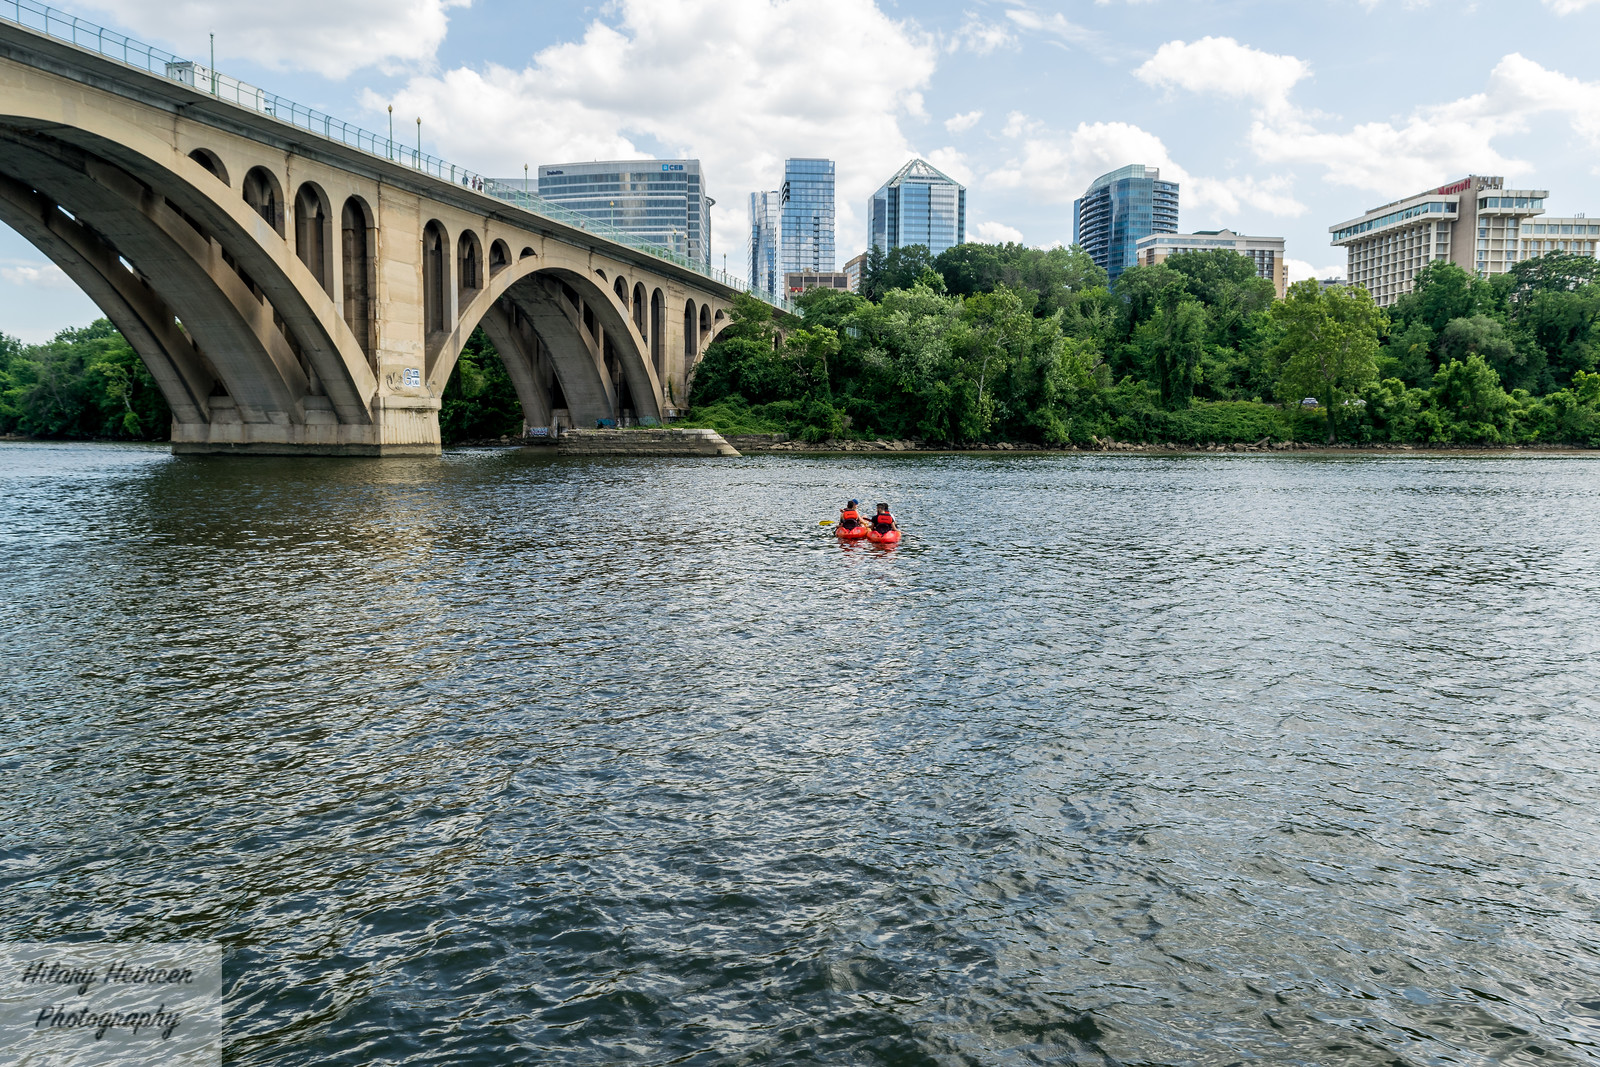 Kayakers on the Potomac